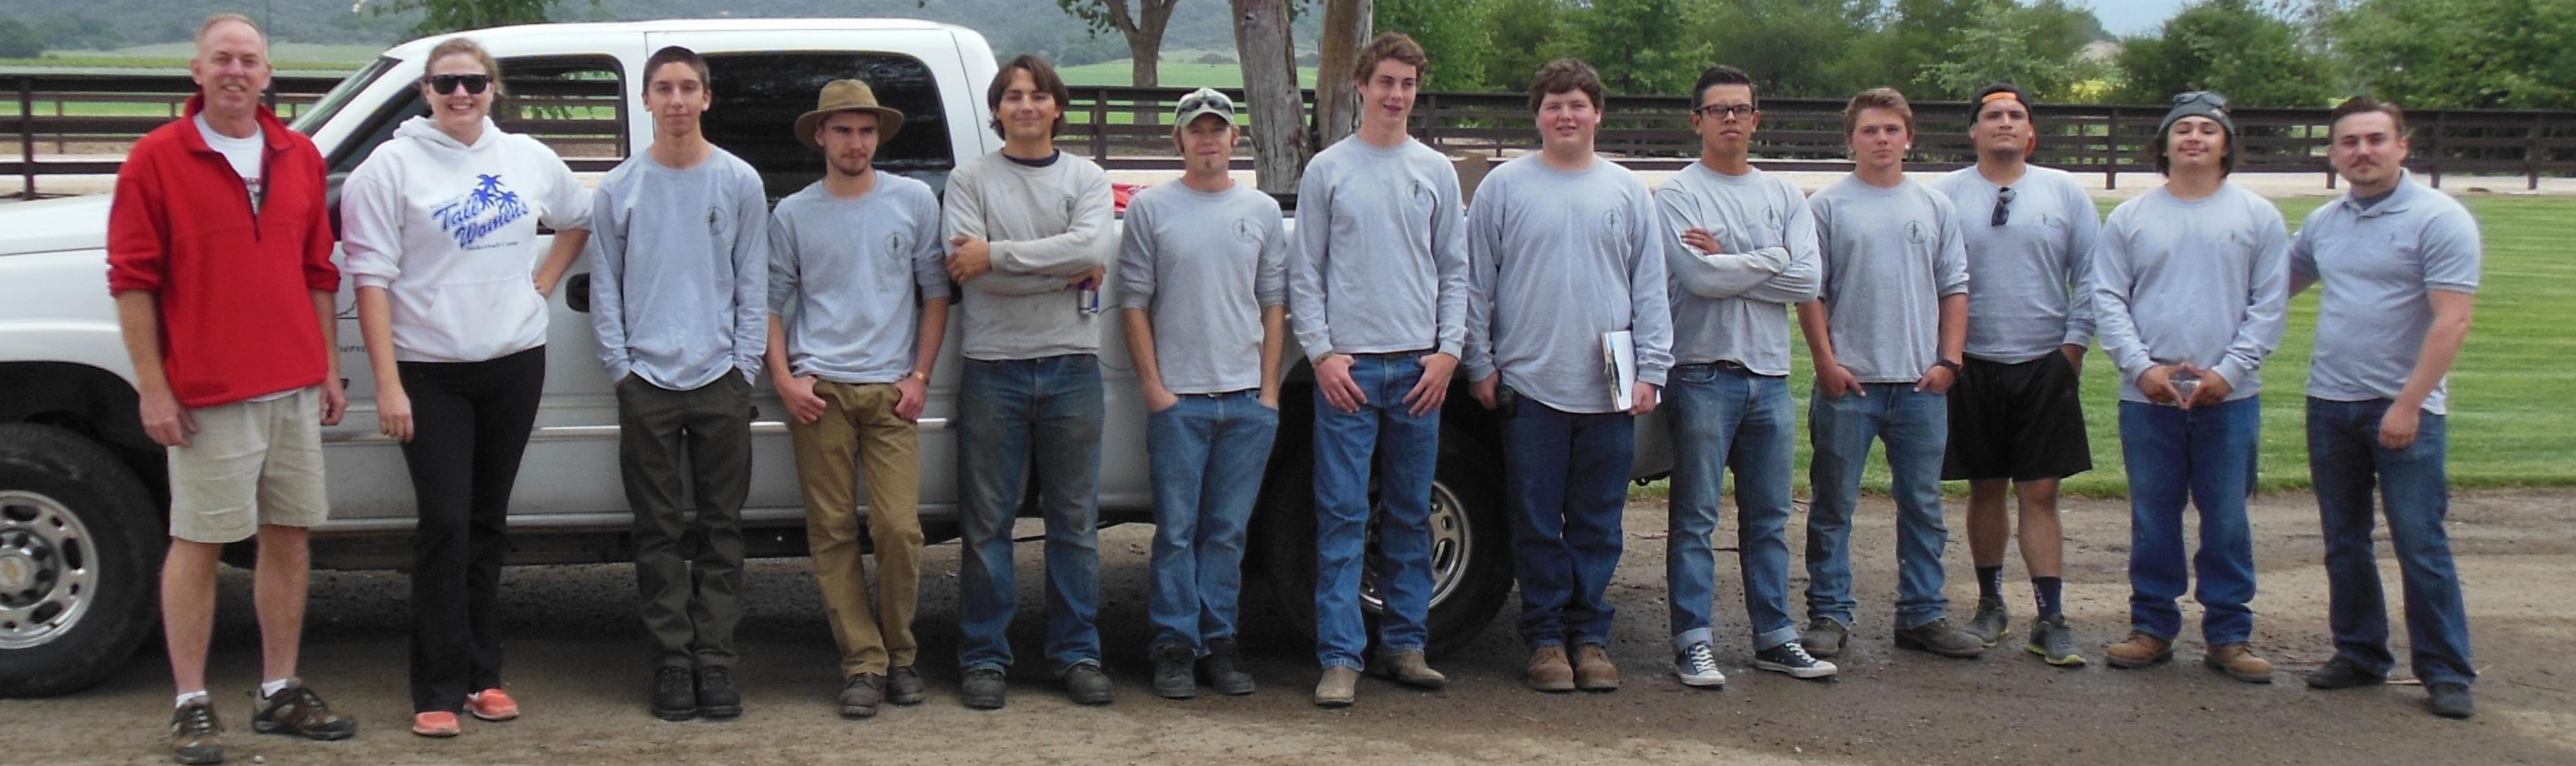 The CREW Staff BBQ 2014